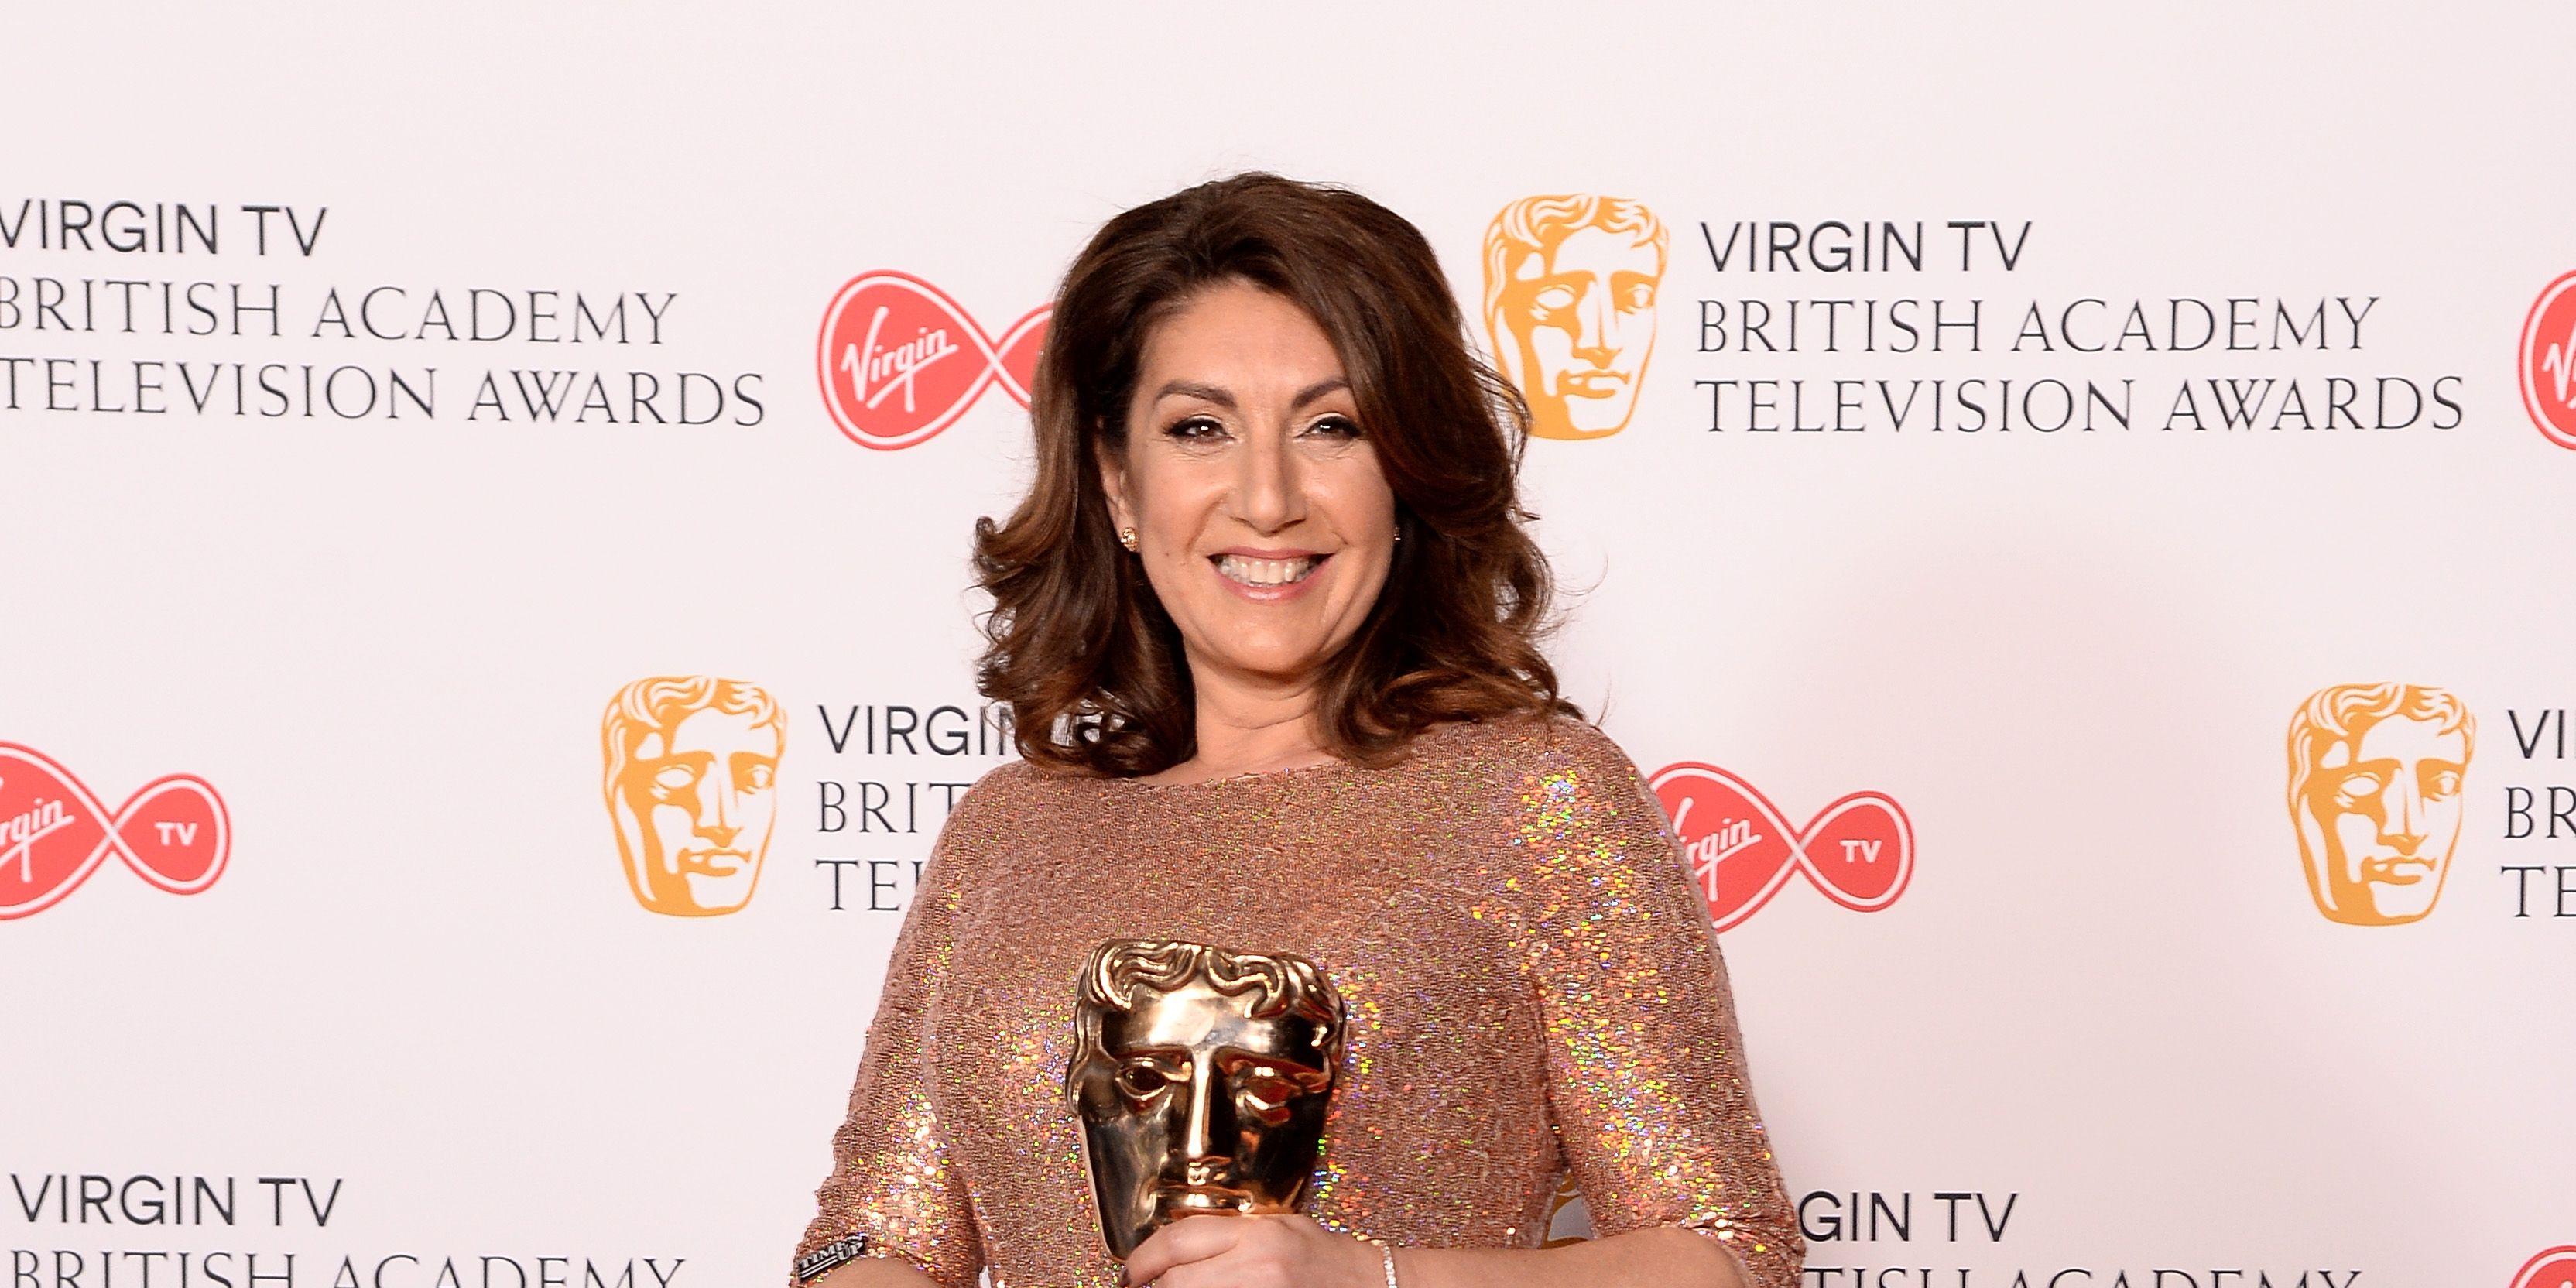 BAFTA TV Awards 2018: Jane McDonald